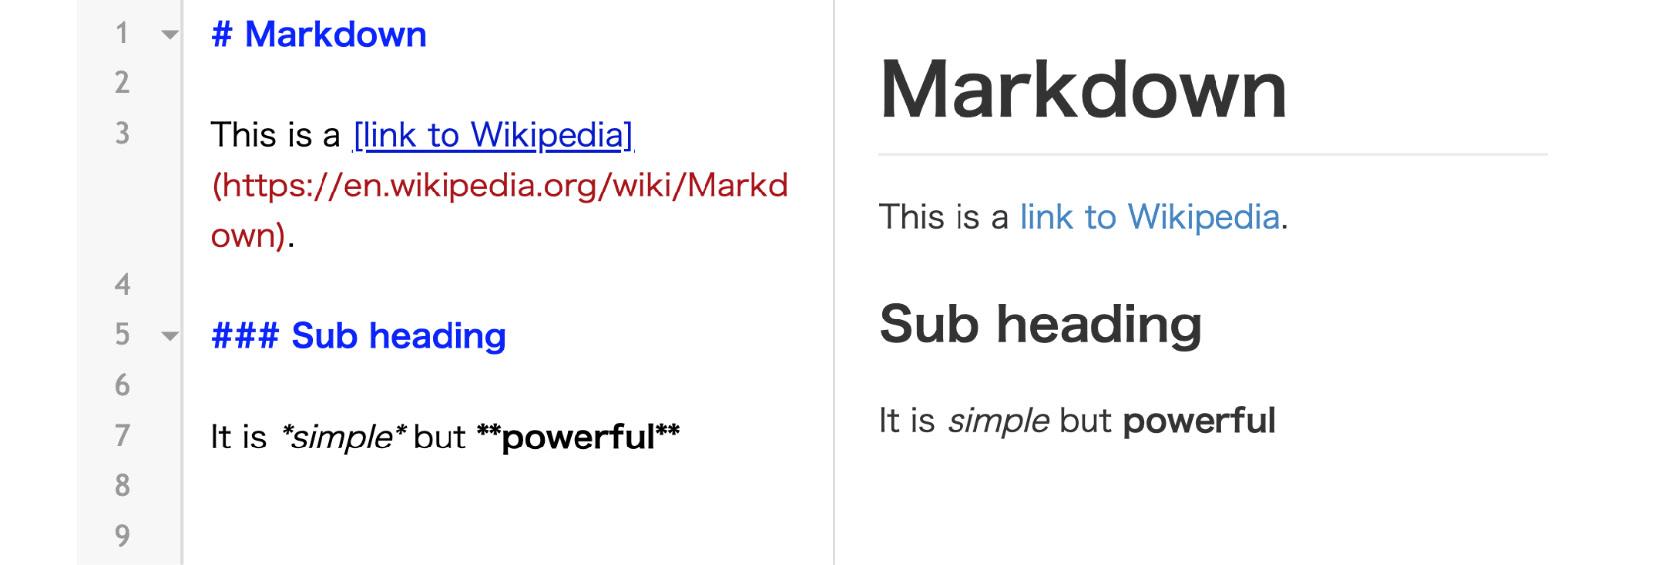 Figure 1.2: Sample Markdown document